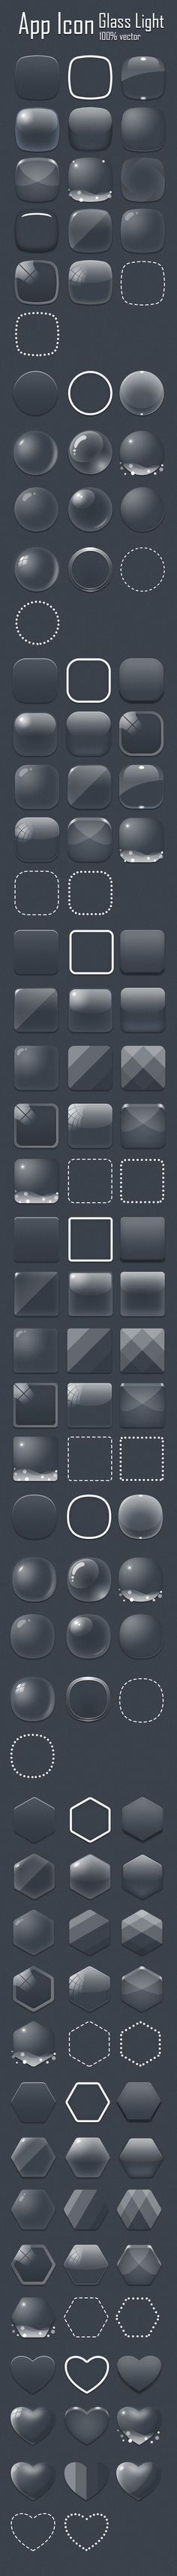 Glass App Icon : Hav...@茶小白采集到GUI(2314图)_花瓣UI/UX